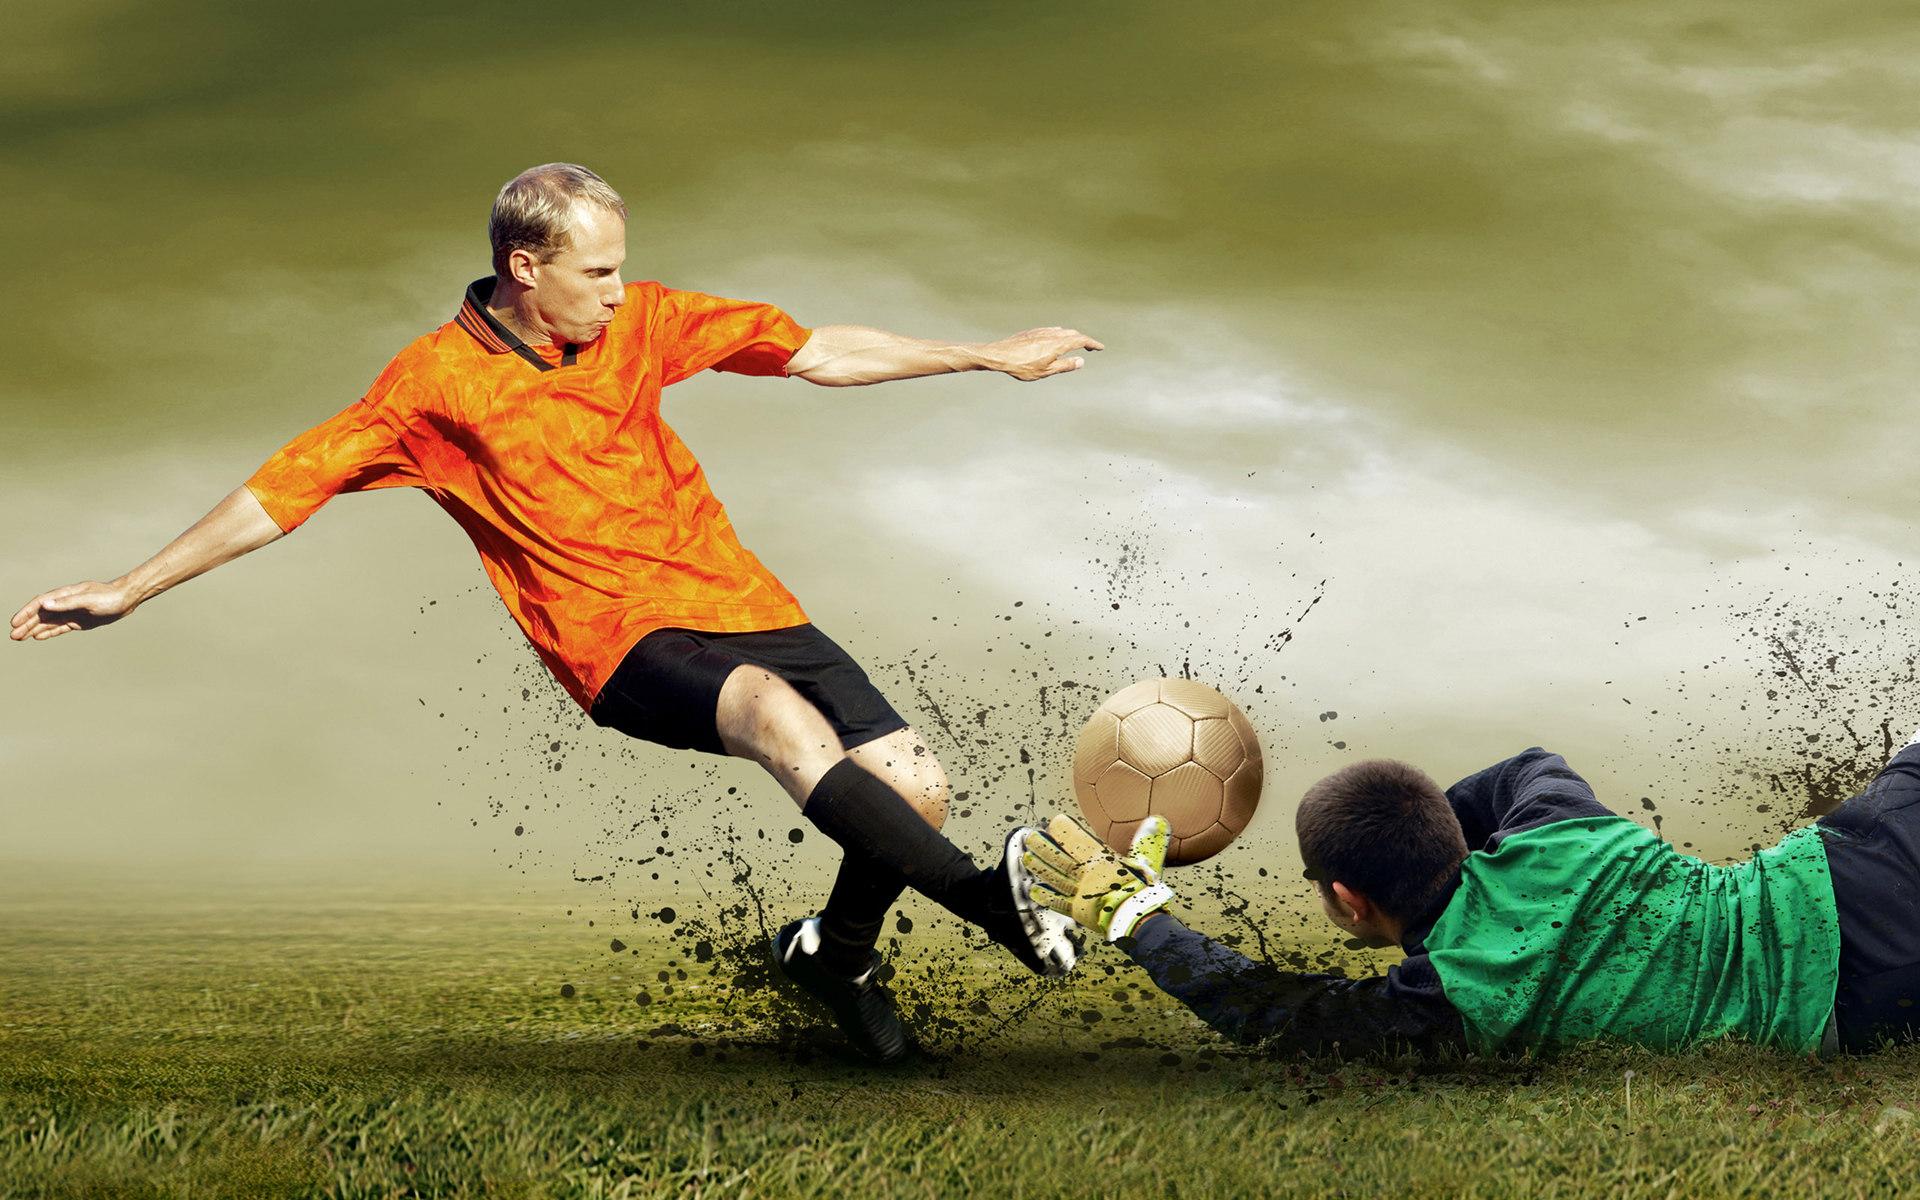 вратарь, футбол, фото, обои на рабочий стол